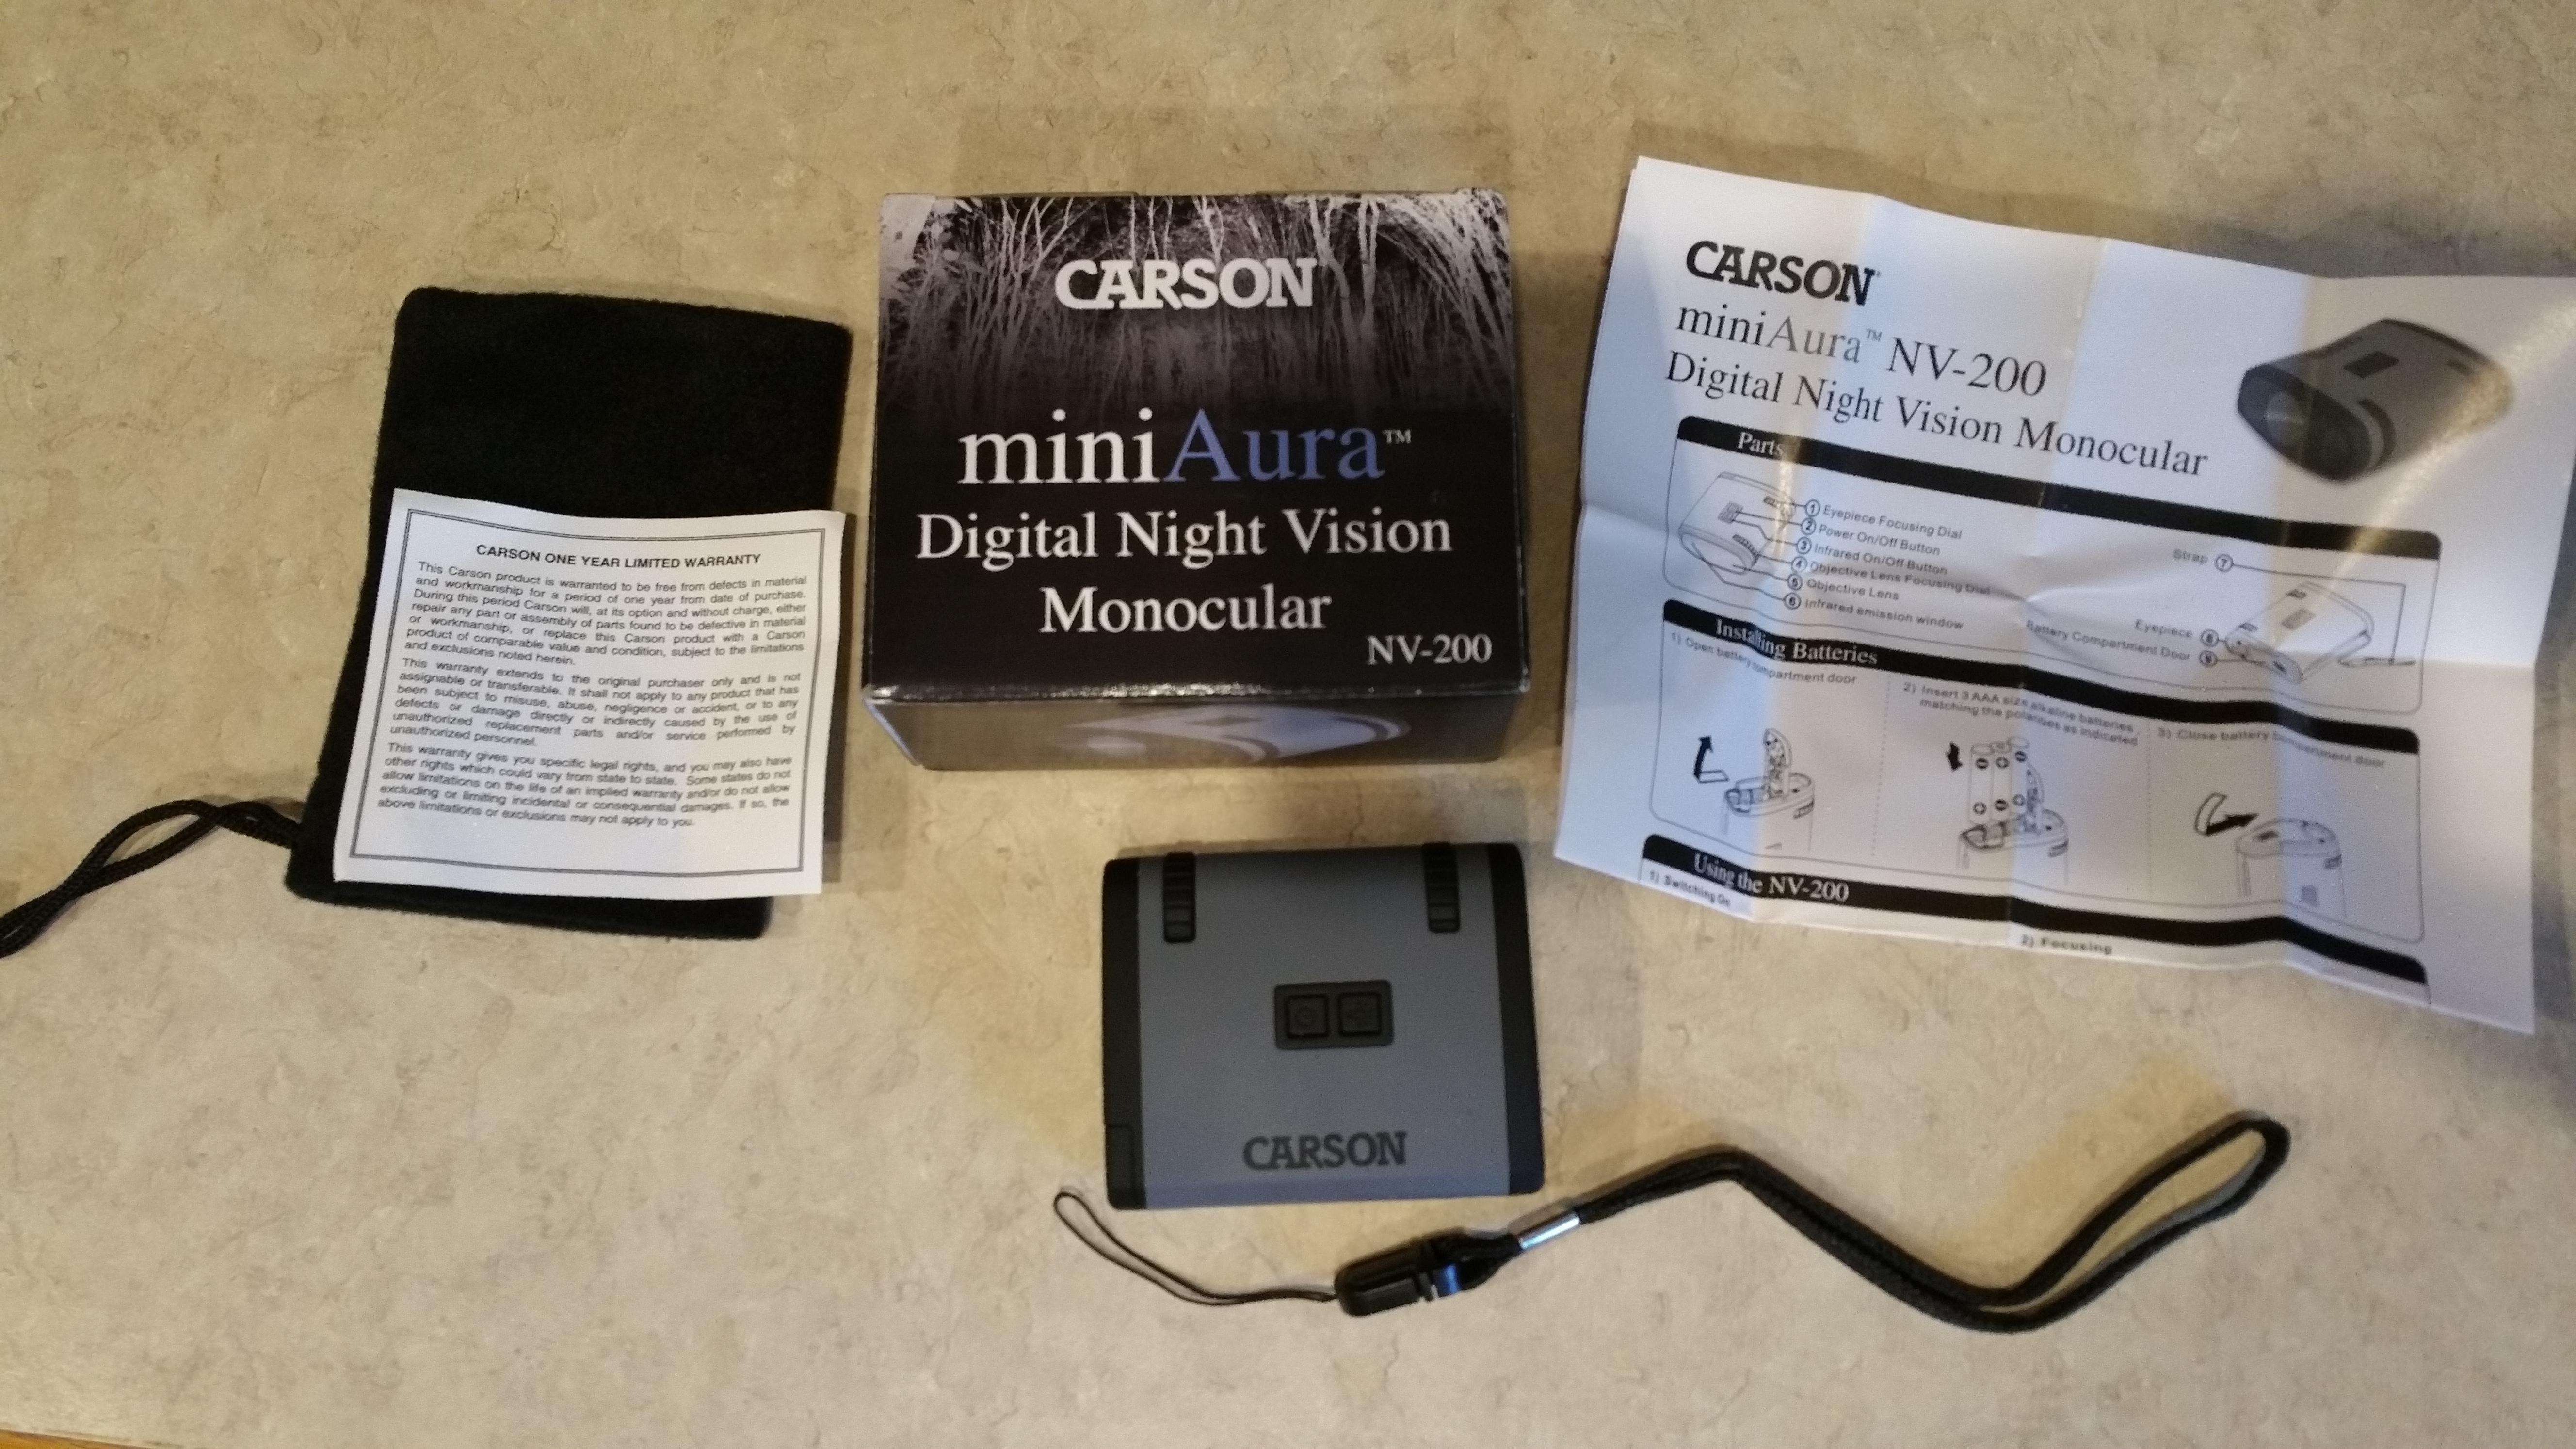 Carson Digital Night Vision Mini Aura NV-200 Review